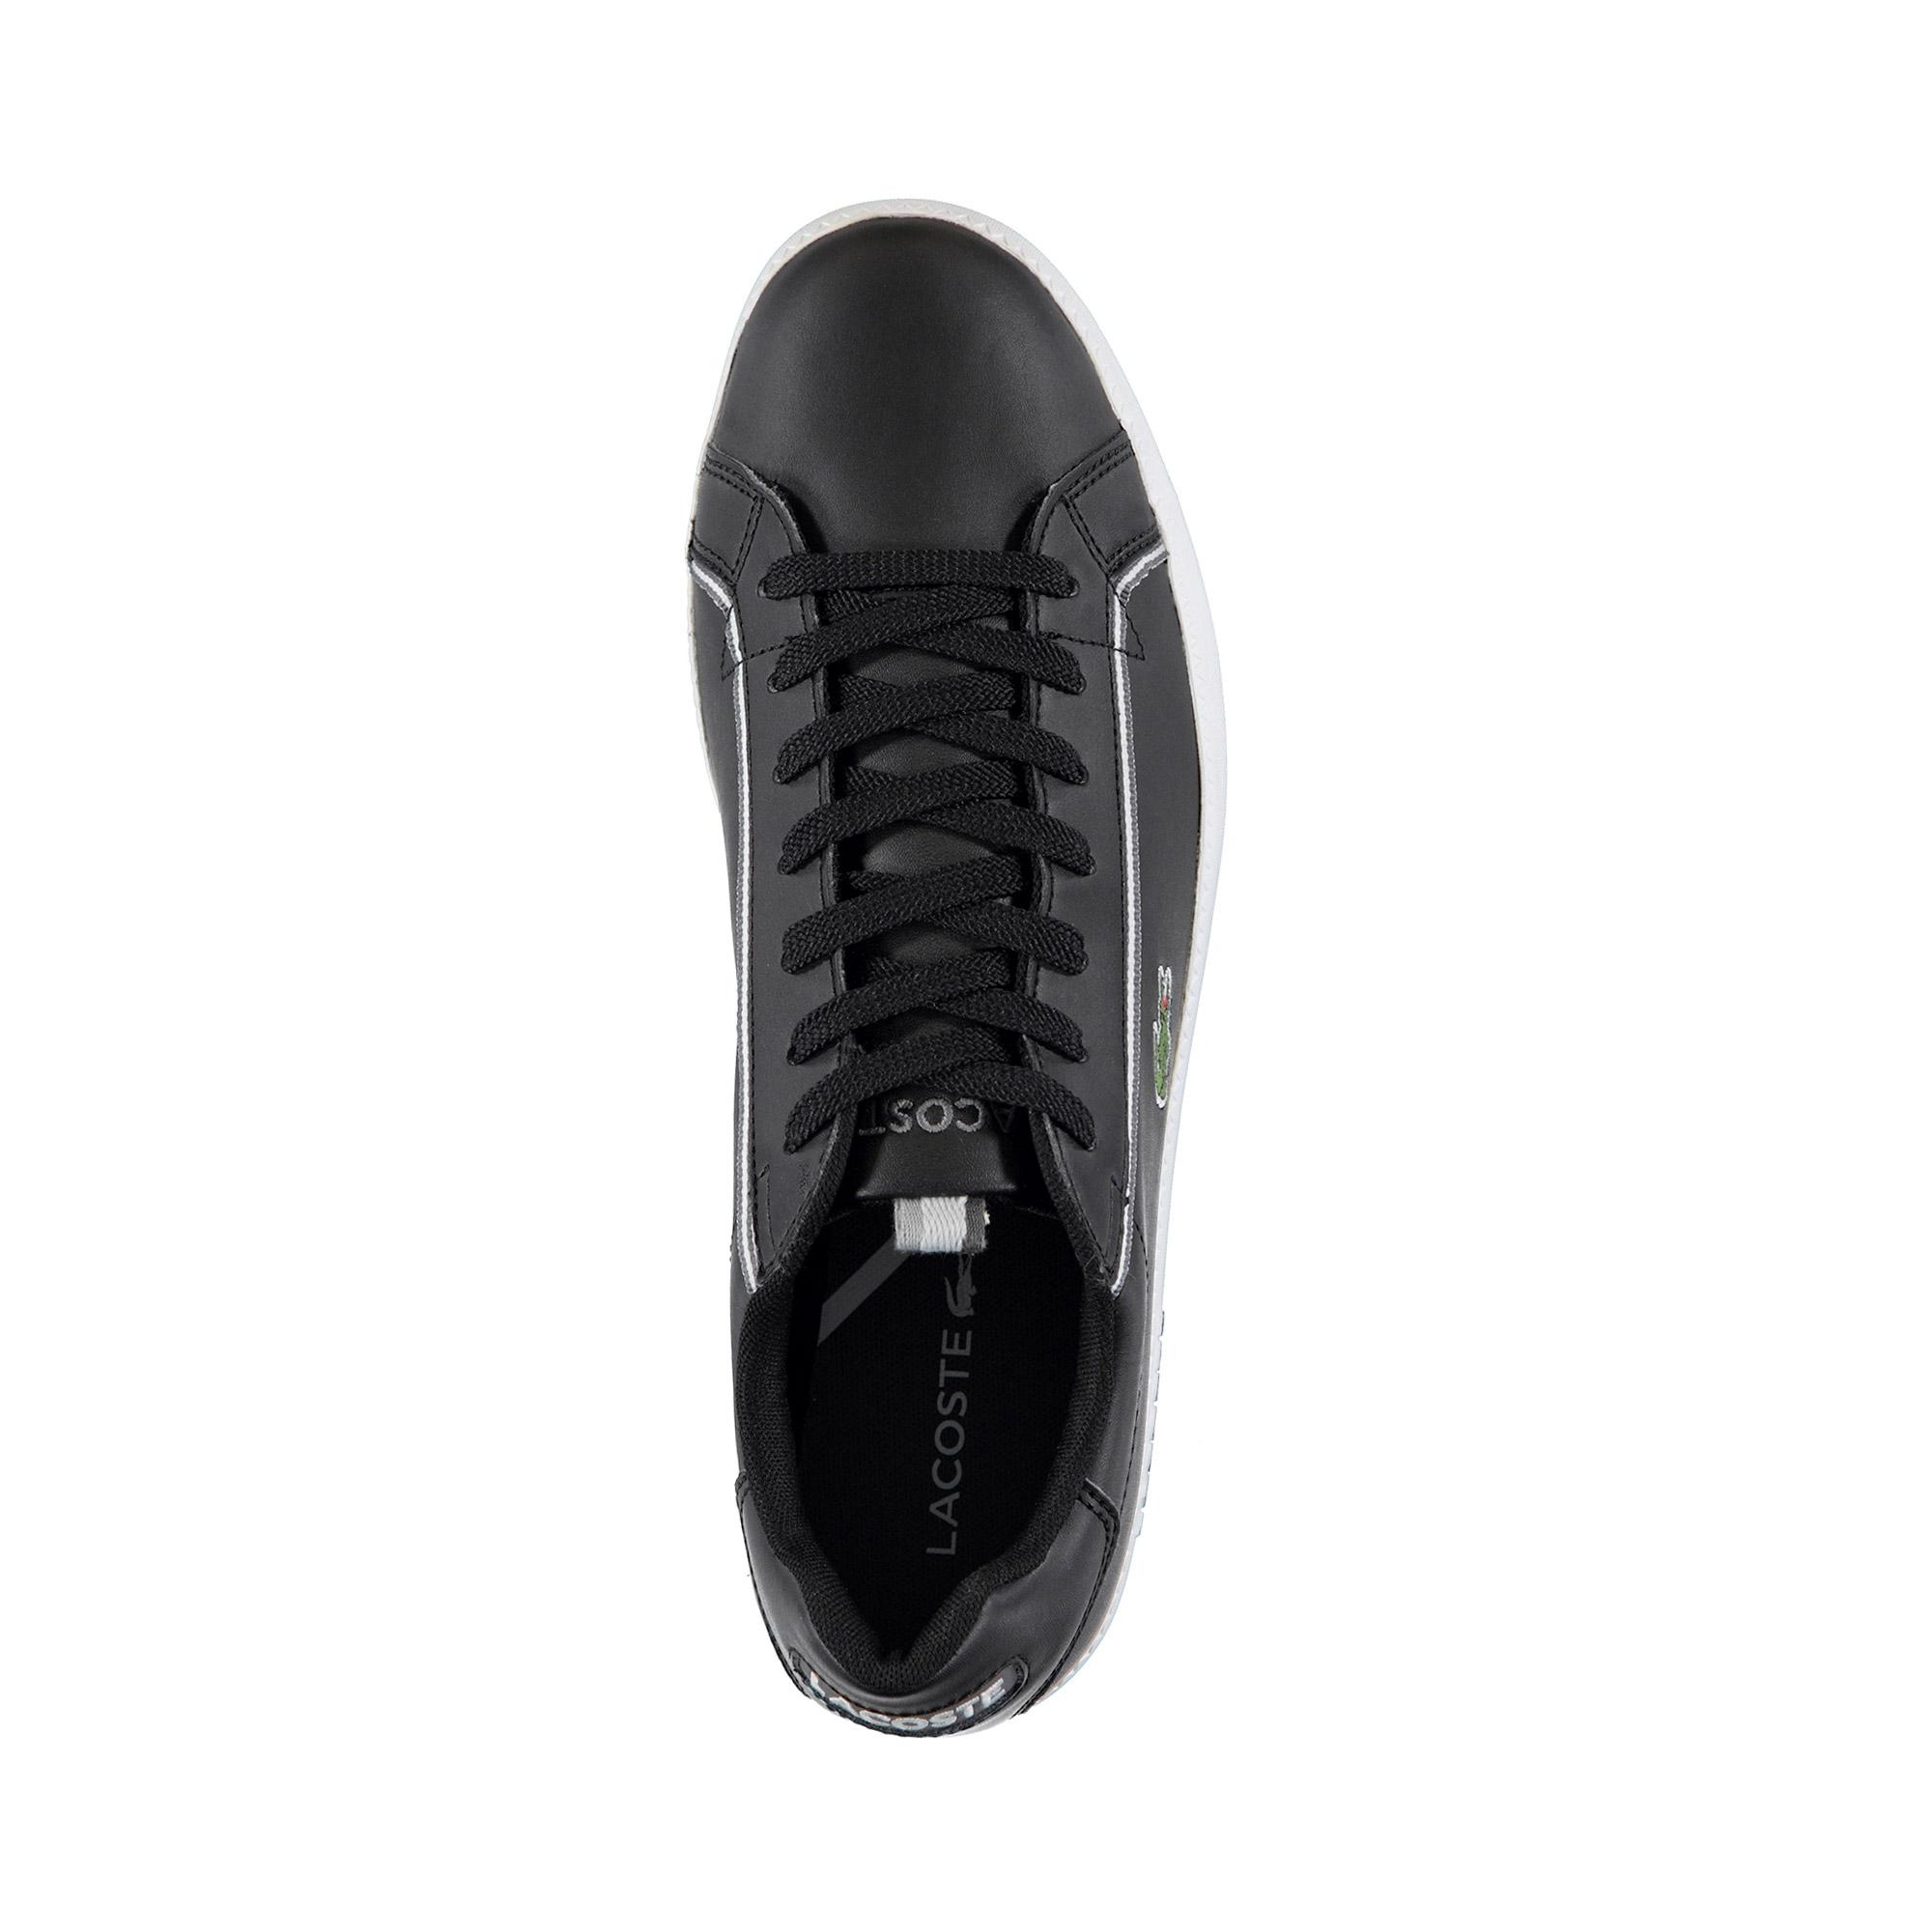 Lacoste кросівки чоловічі Graduate